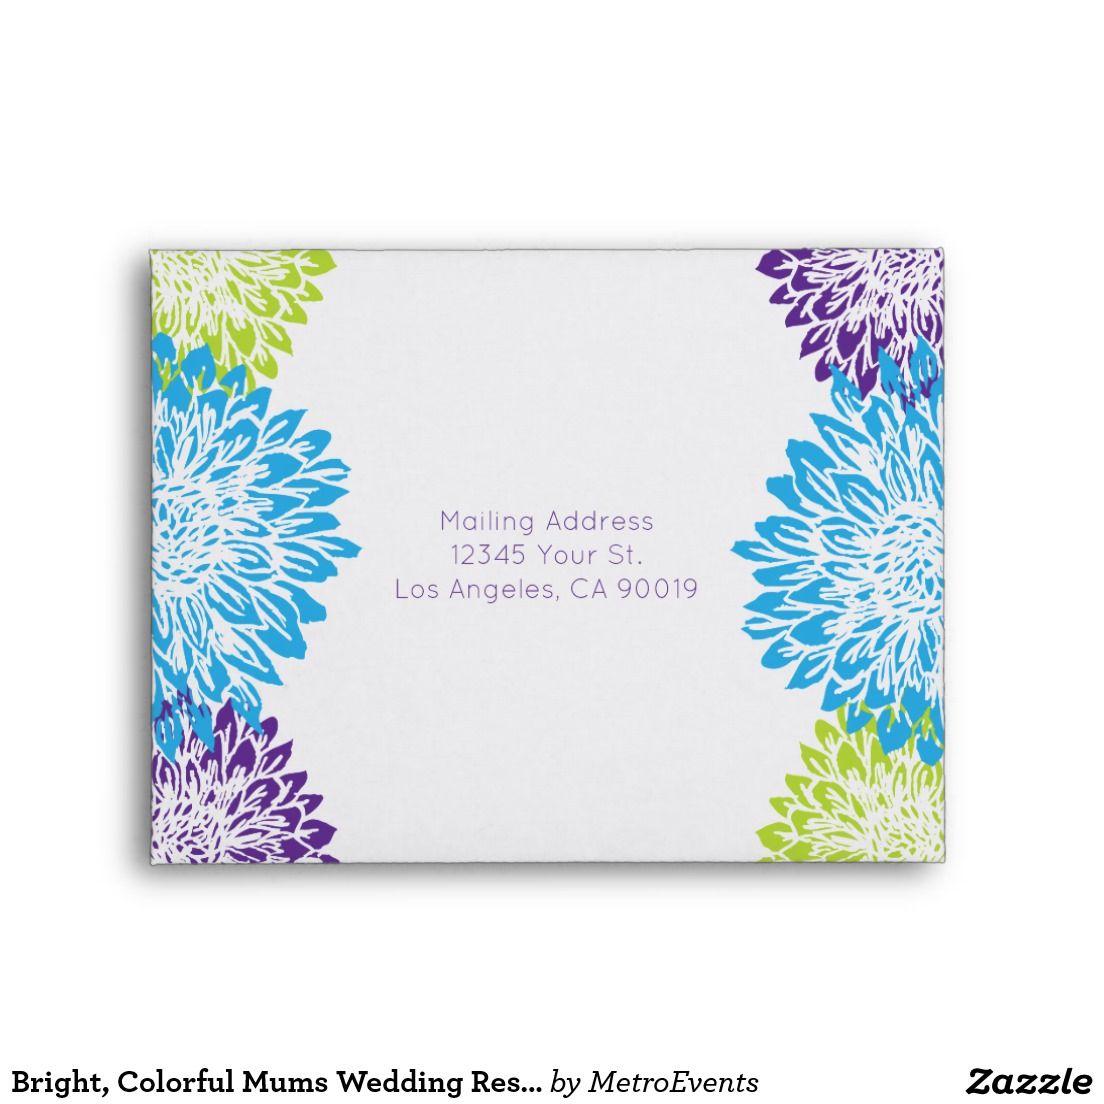 Bright colorful mums wedding response wedding response